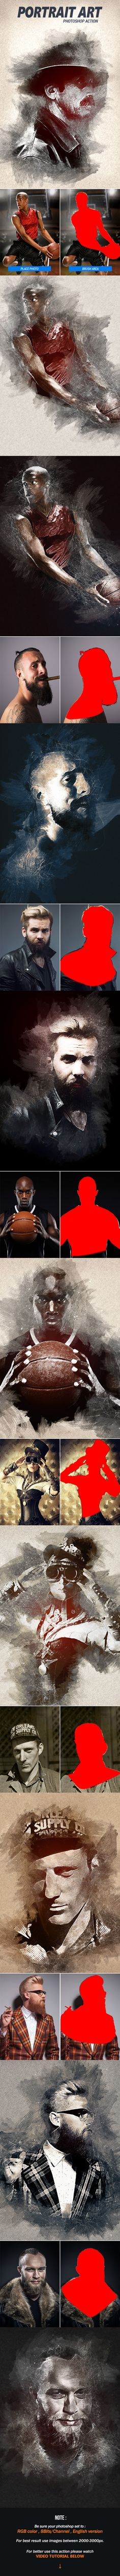 PortraitArt - Photoshop Action. Download here: https://graphicriver.net/item/portraitart-photoshop-action/17103924?ref=ksioks